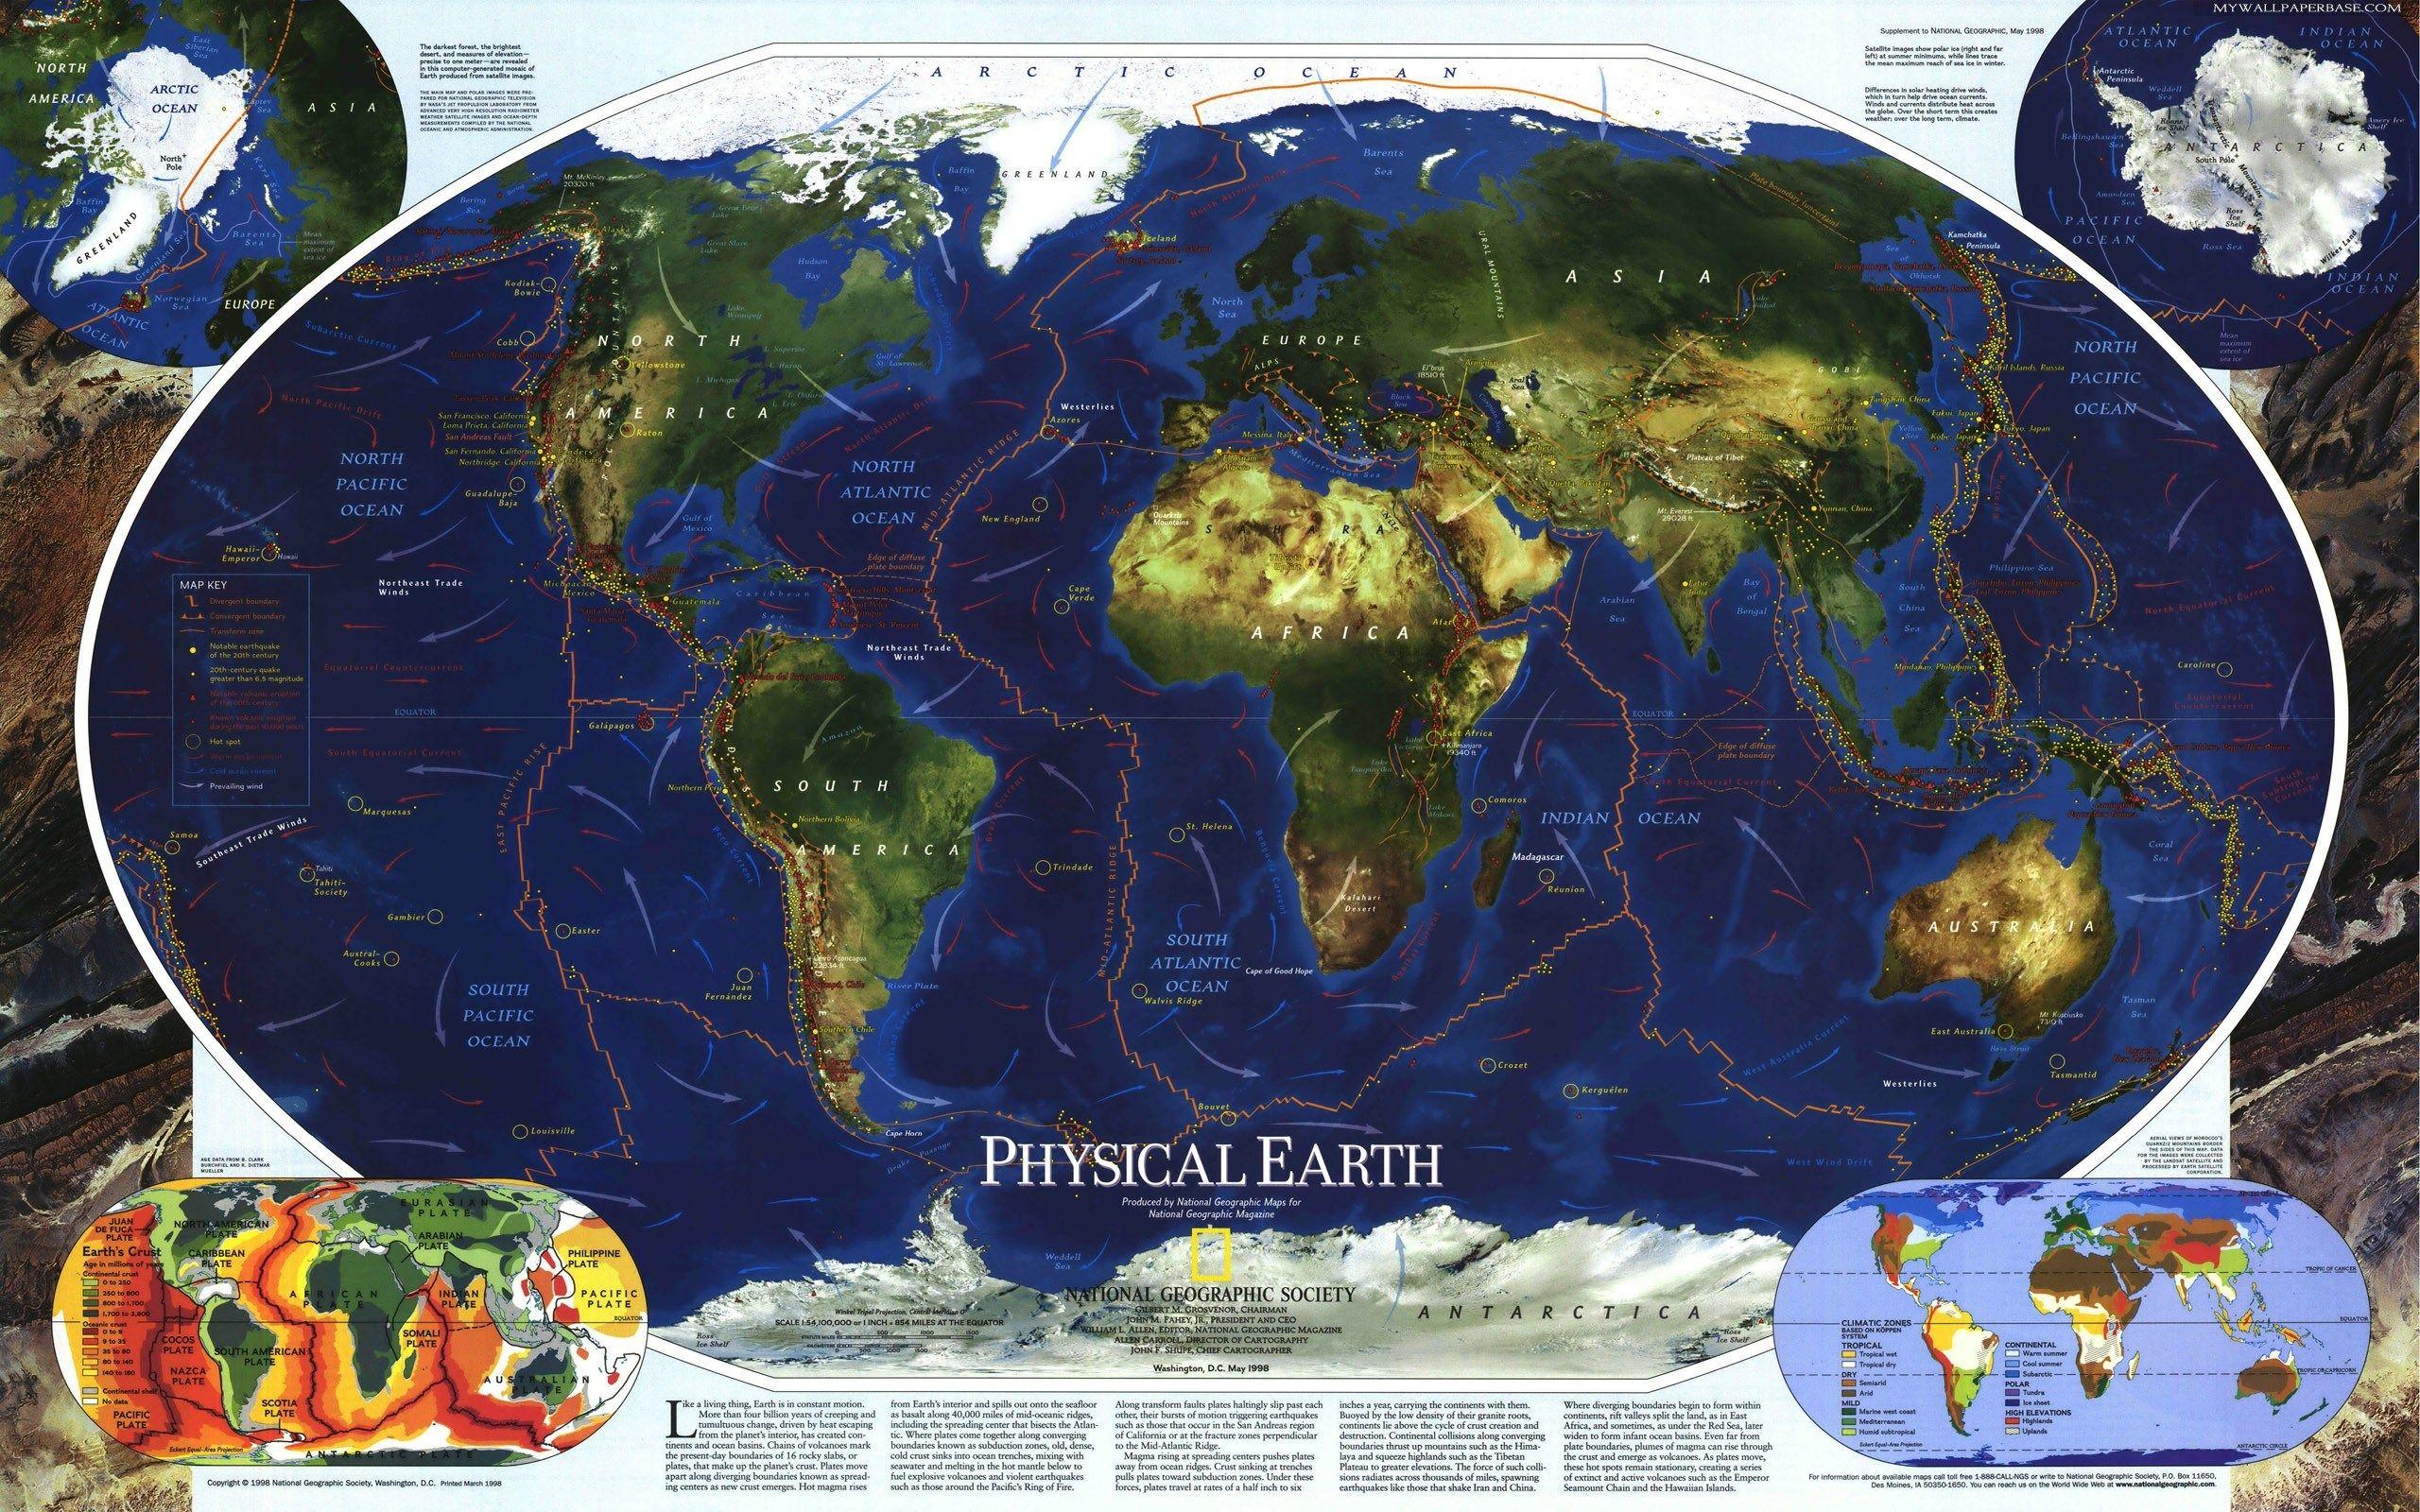 Free desktop wallpaper downloads world map 2560x1600 1166 kb free desktop wallpaper downloads world map 2560x1600 1166 kb gumiabroncs Choice Image